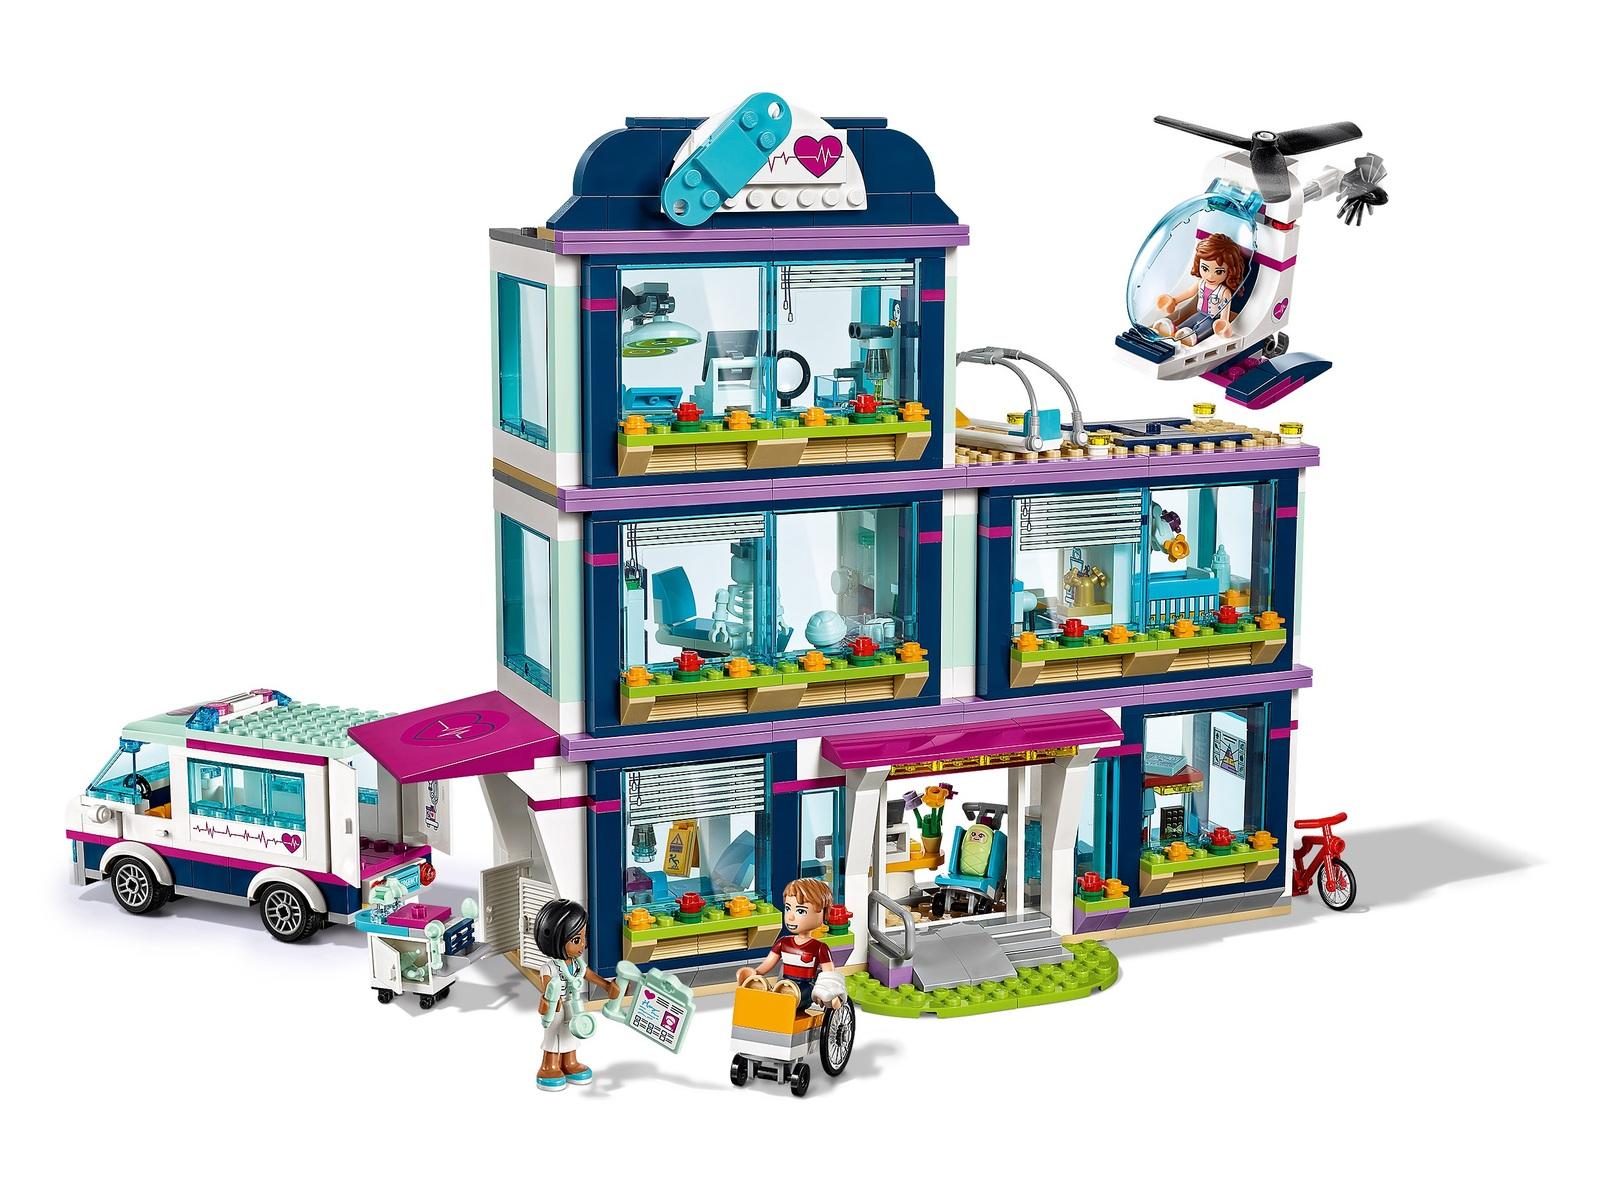 LEGO Friends: Heartlake Hospital (41318) image